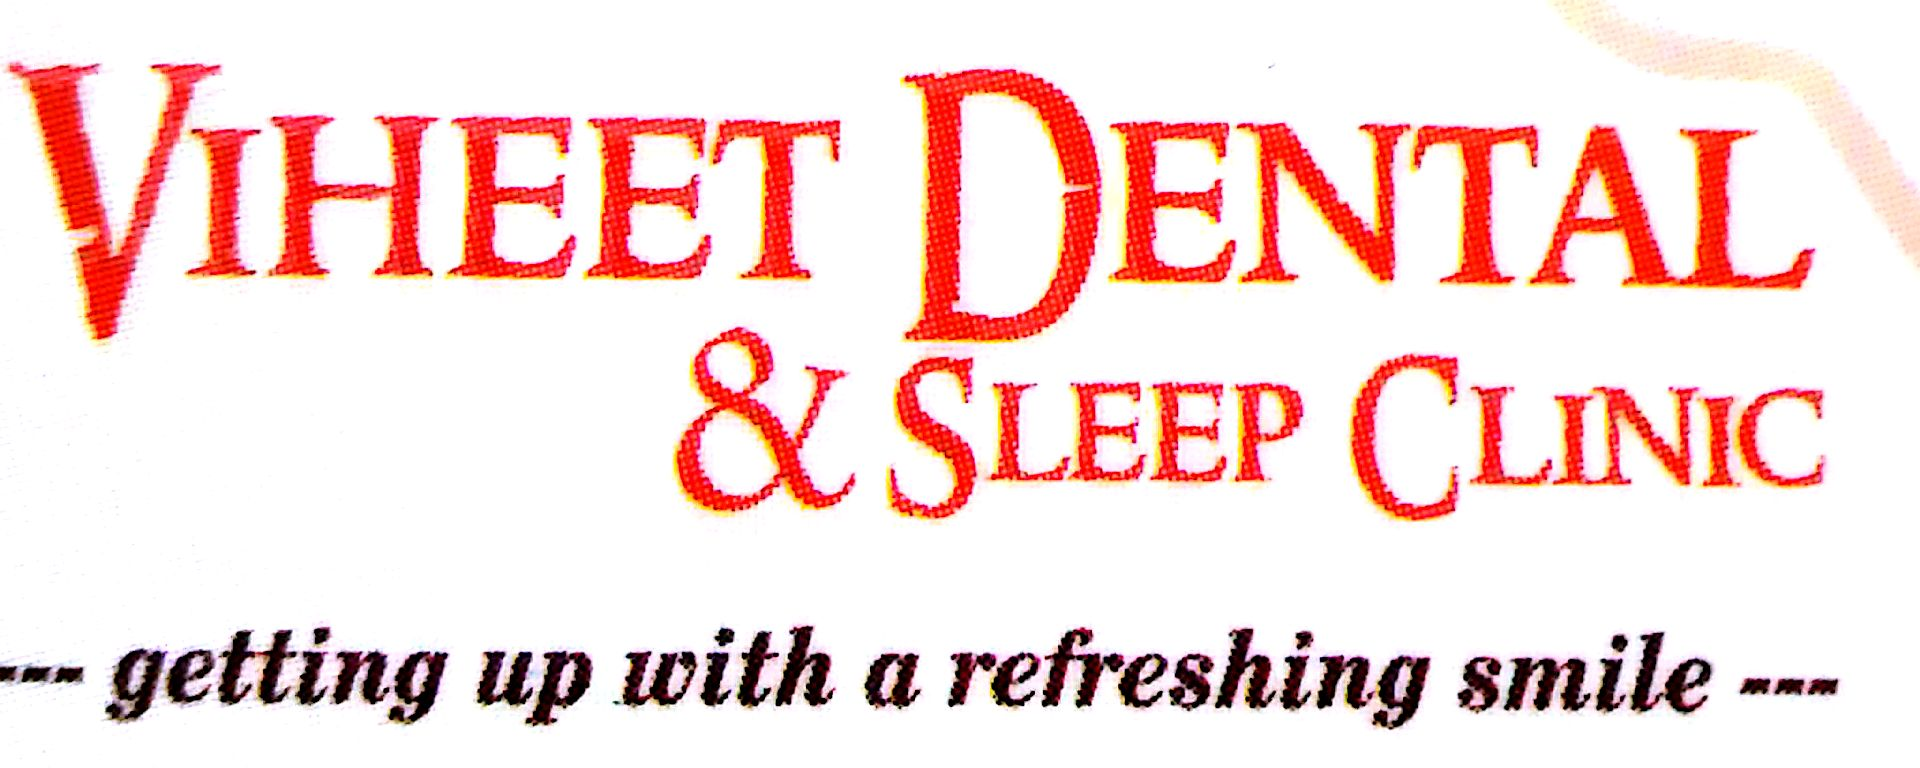 Viheet Dental & Sleep Clinic